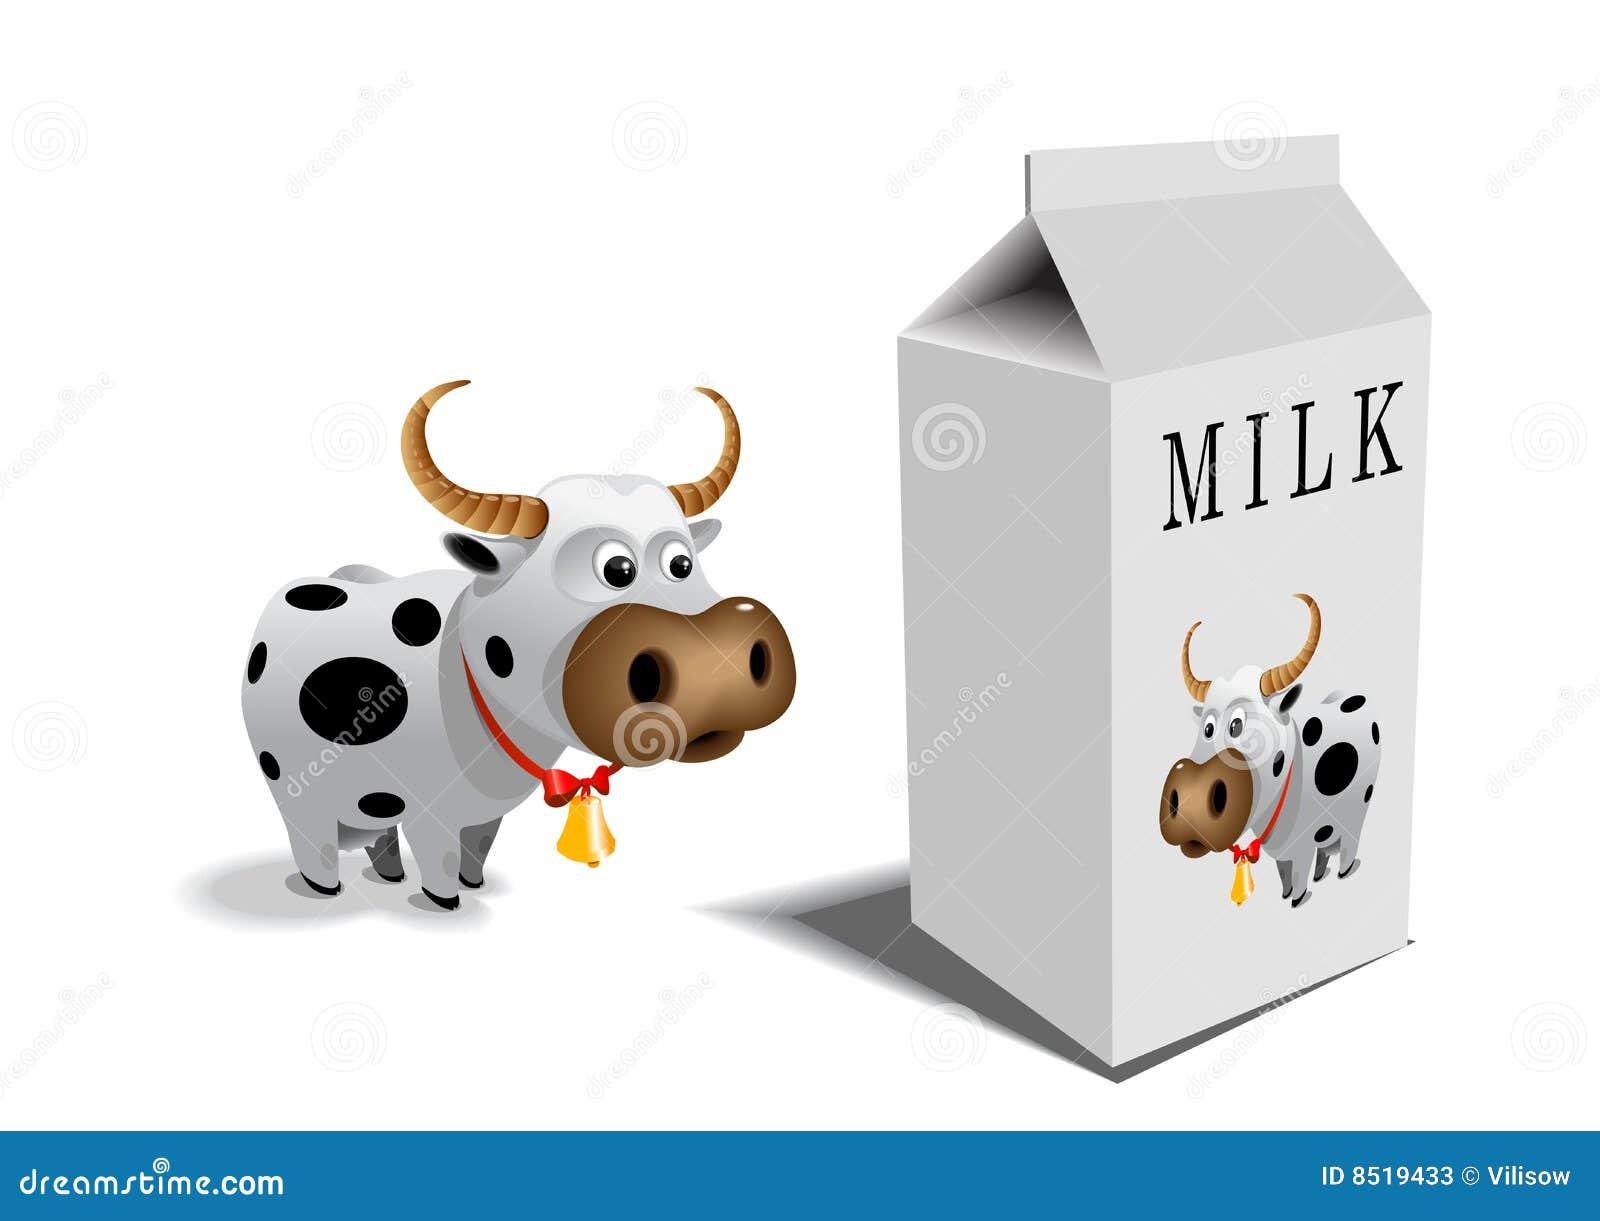 Cow Milk Animation Cow and milk box